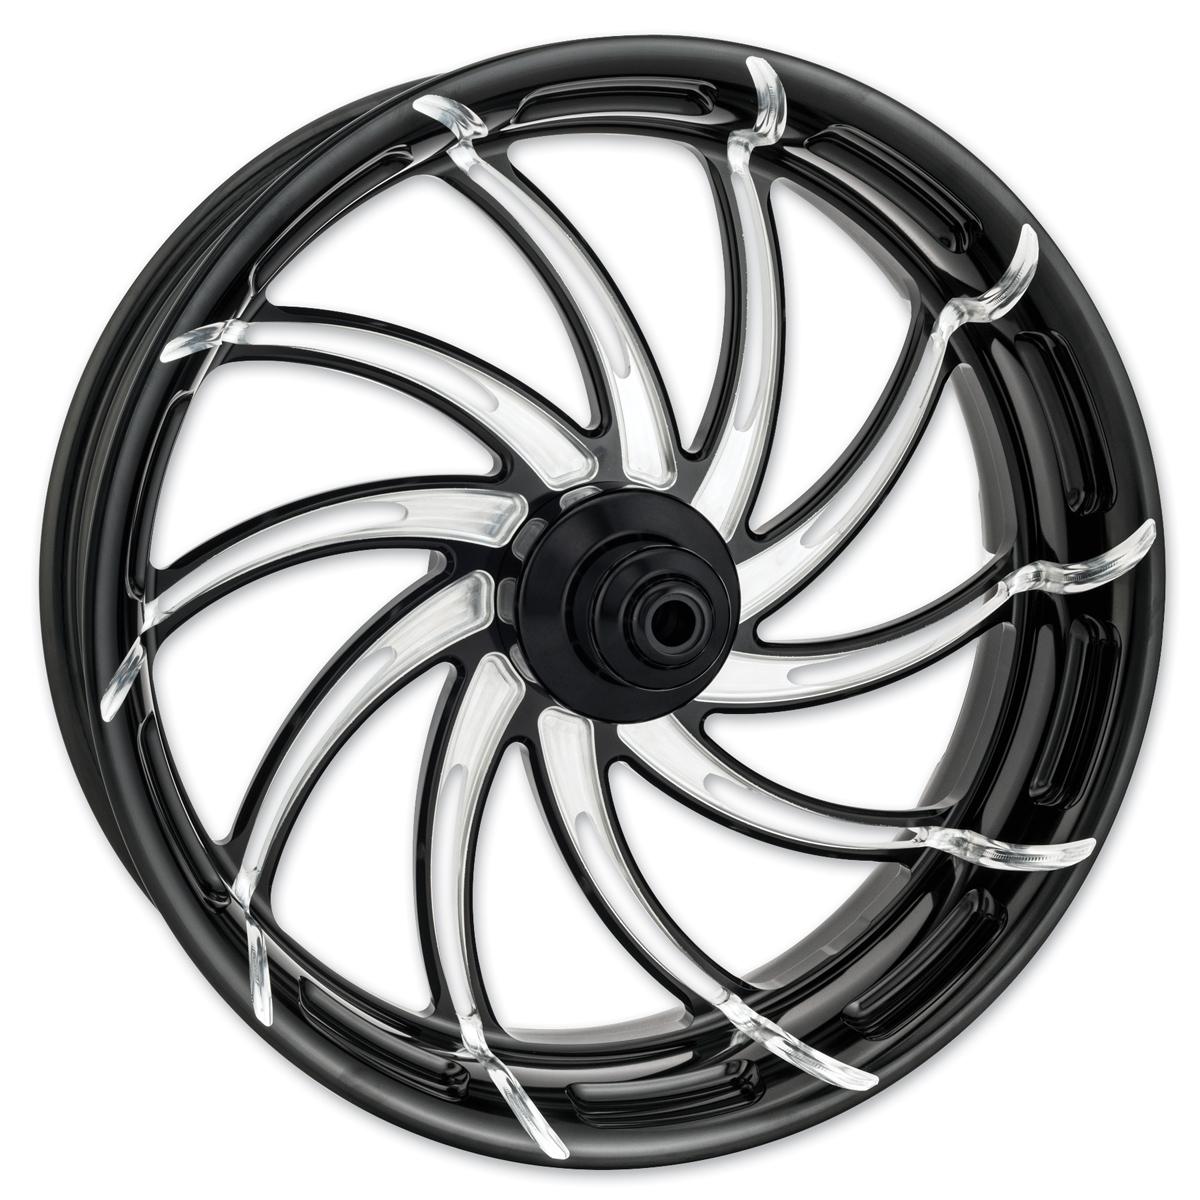 Performance Machine Supra Platinum Cut Front Wheel 21x2.15 Non-ABS